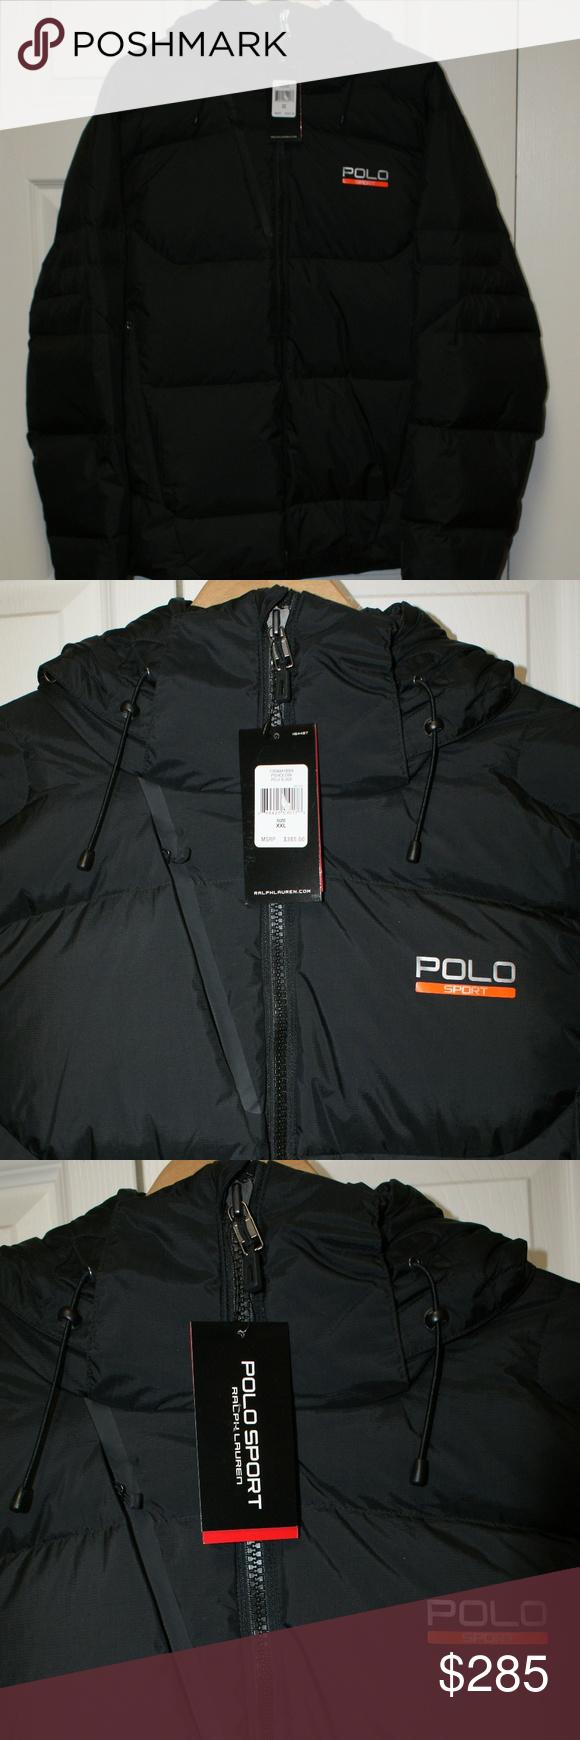 Ralph Lauren Polo Sport Down Puffer Jacket Xxl Clothes Design Ralph Lauren Jackets Fashion Design [ 1740 x 580 Pixel ]